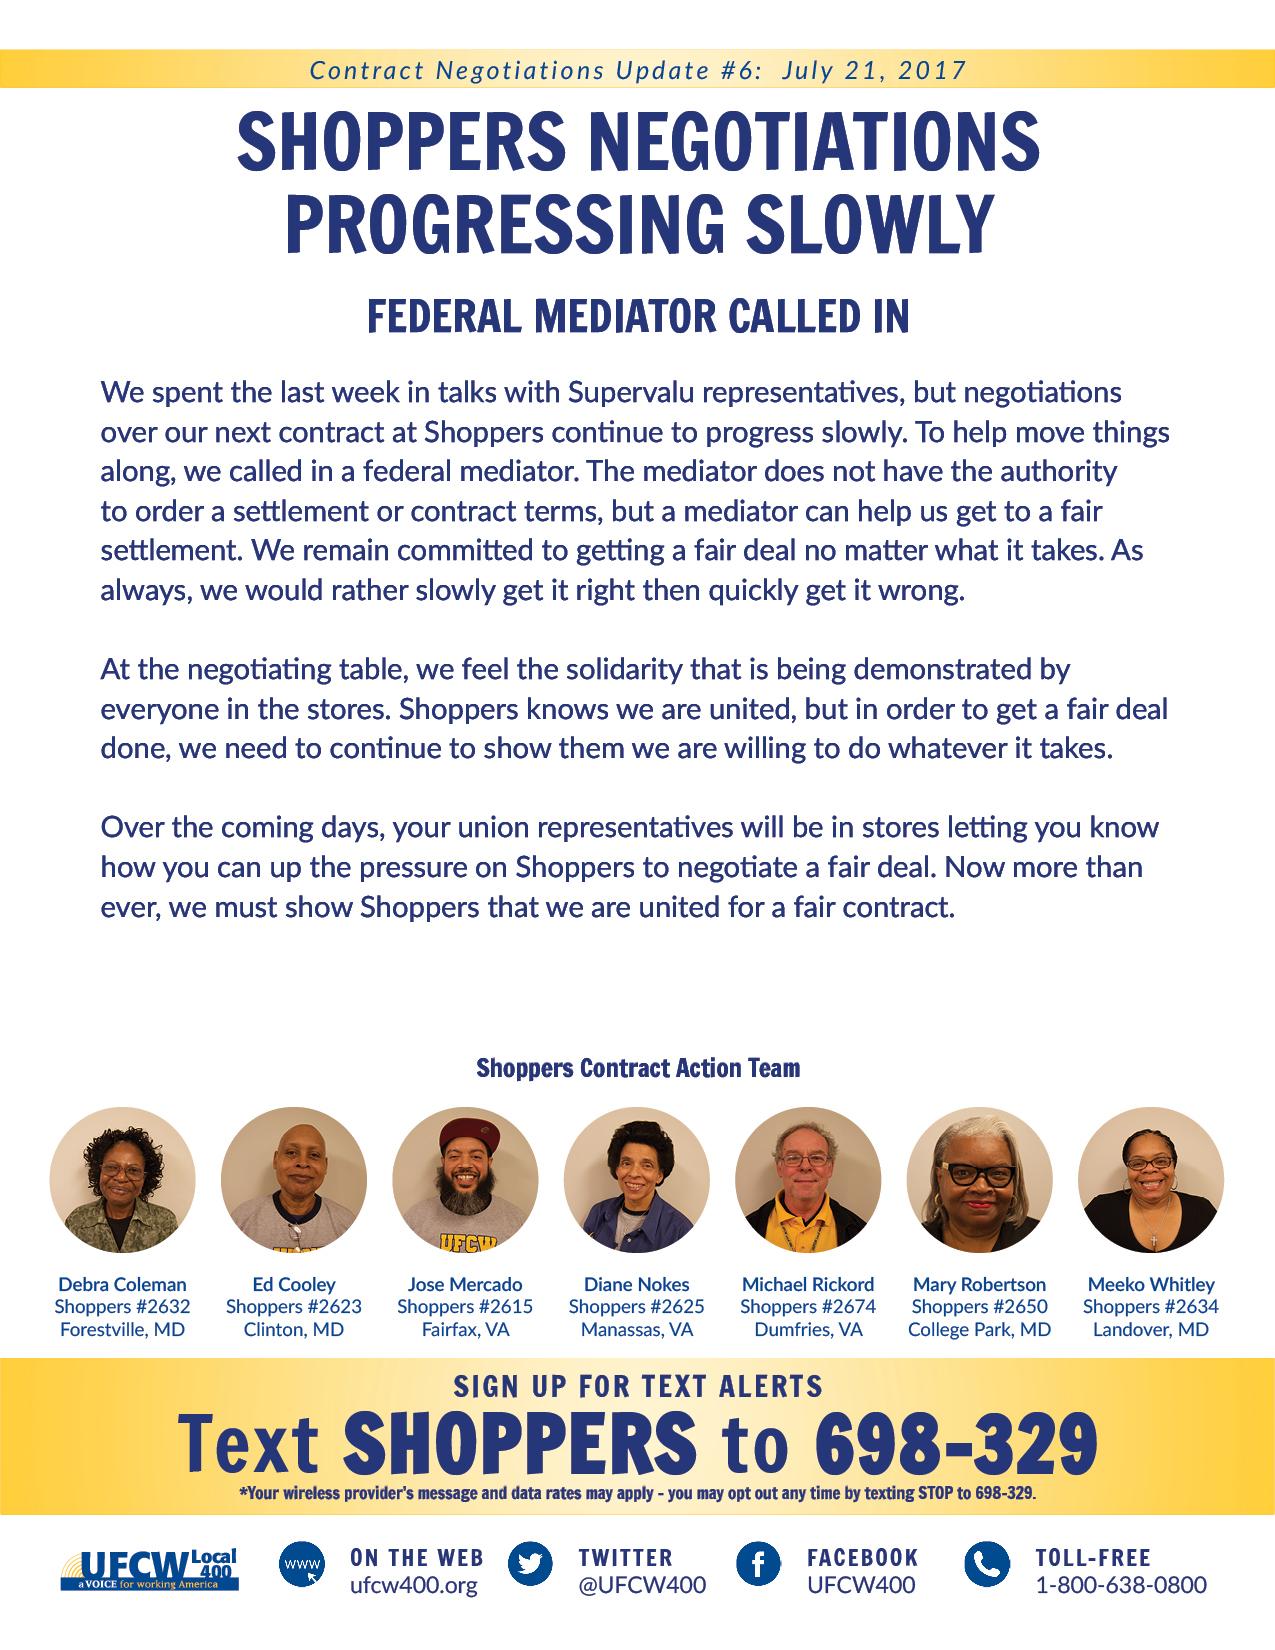 Shoppers Negotiations Progressing Slowly